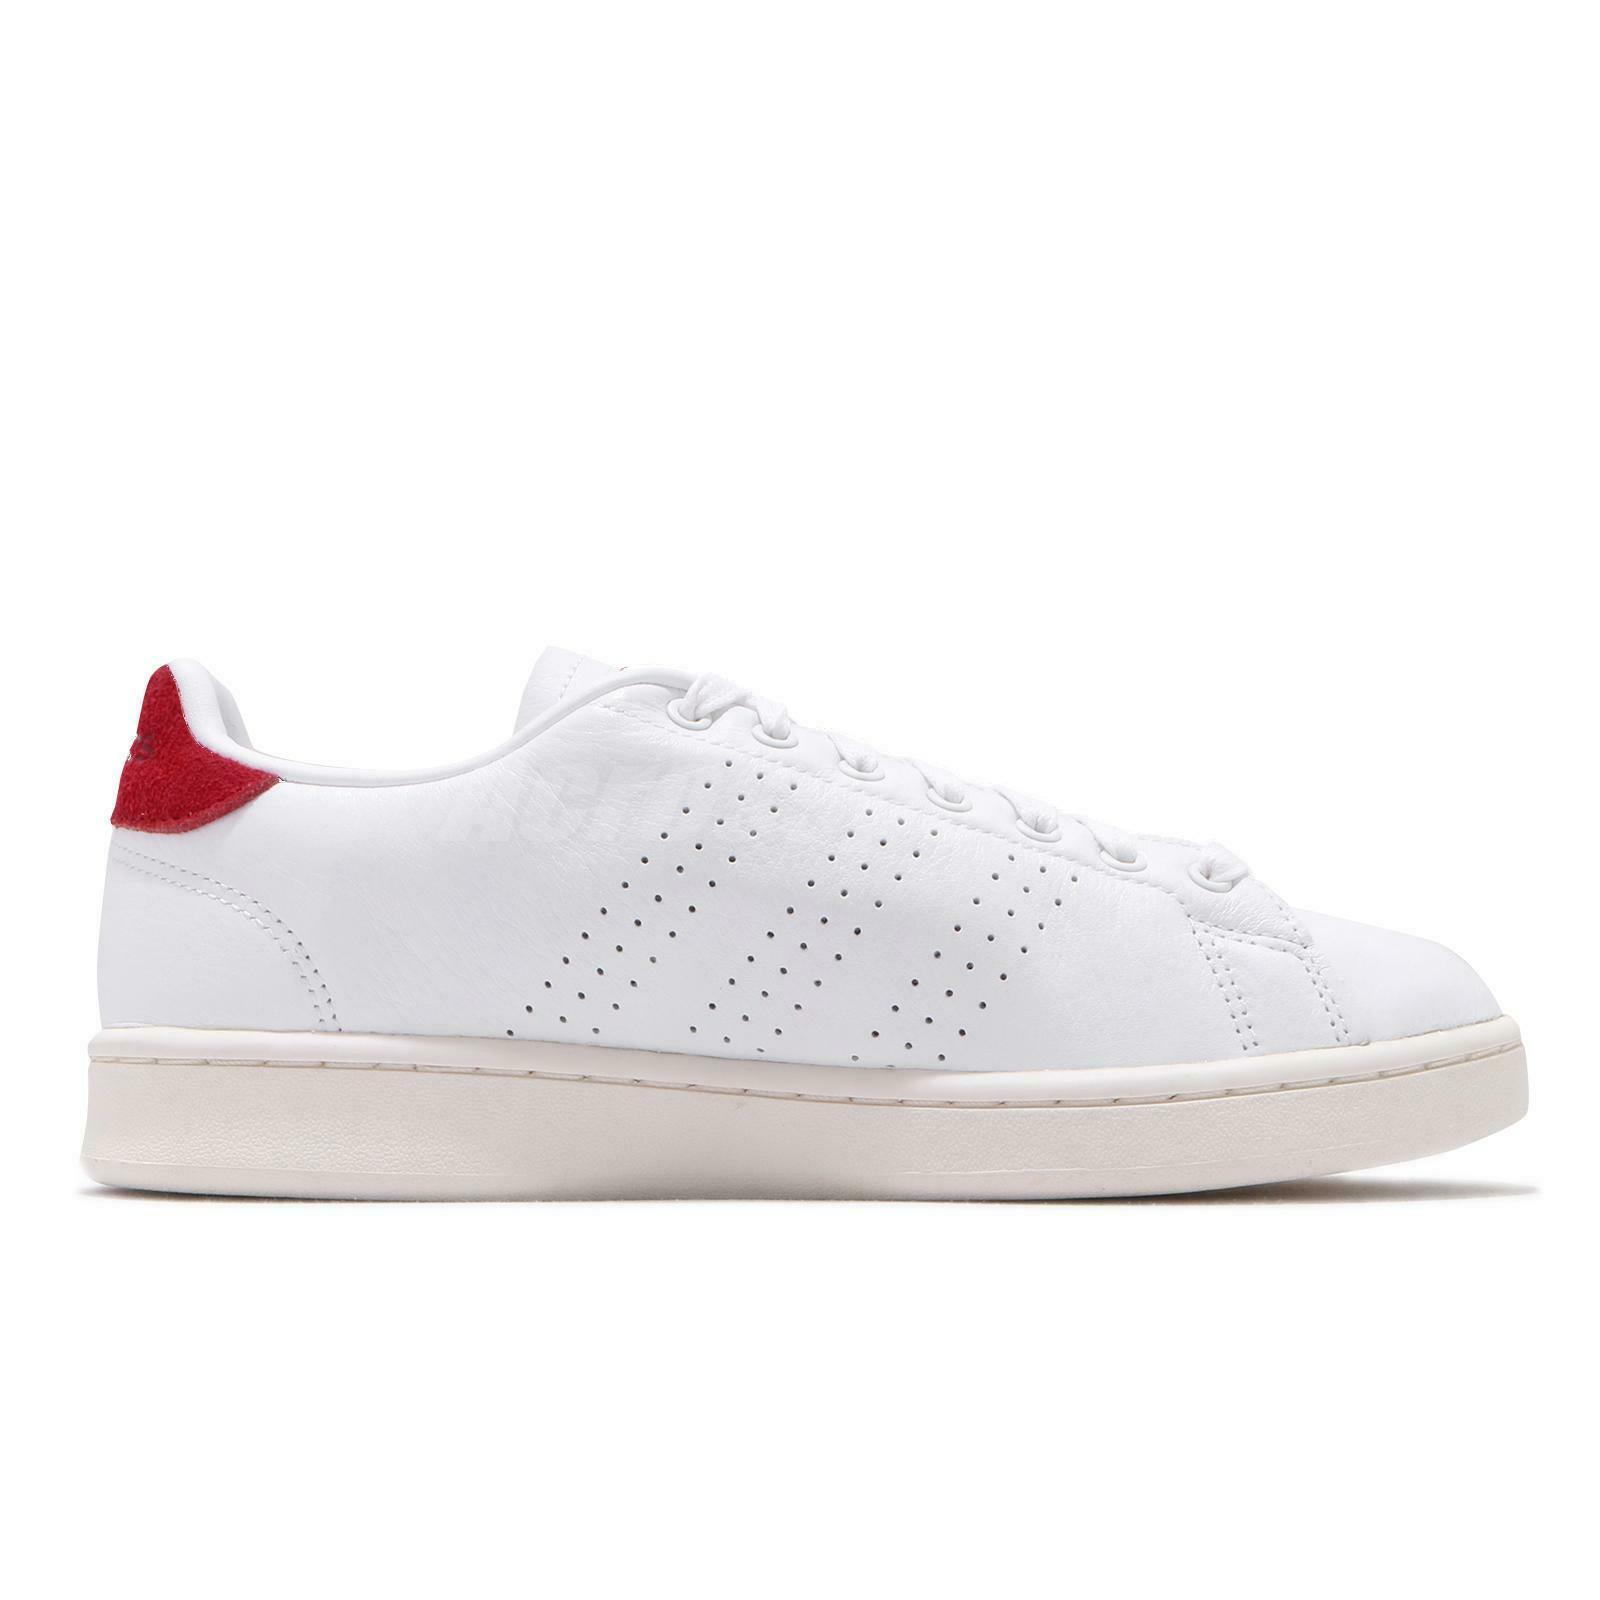 Adidas Advantage Sneakers Ανδρικά Παπούτσια λευκό EG3773  - Λευκό - Size: 40